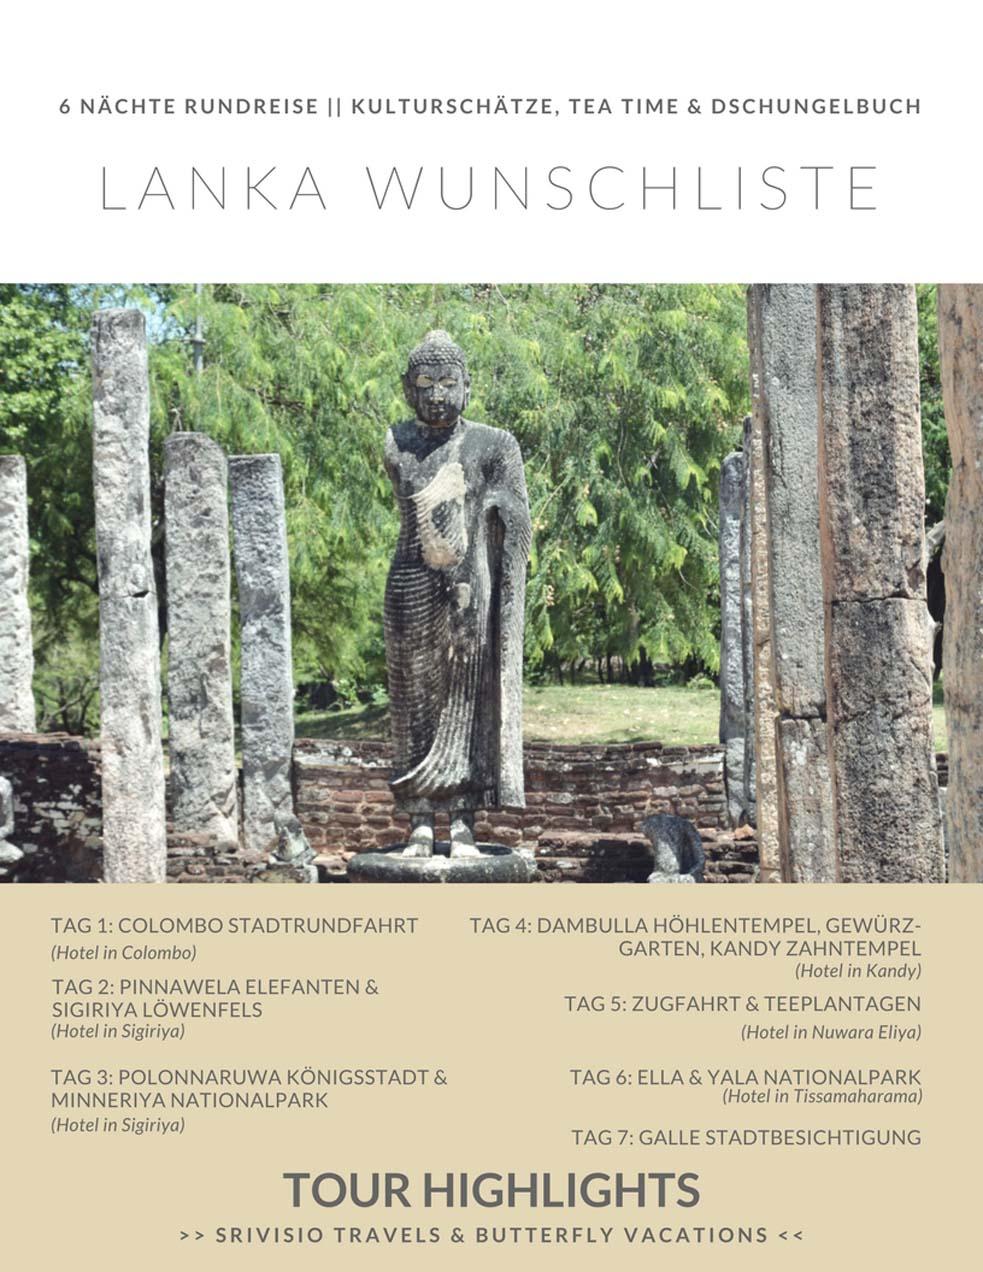 Sri Lanka Wunschliste